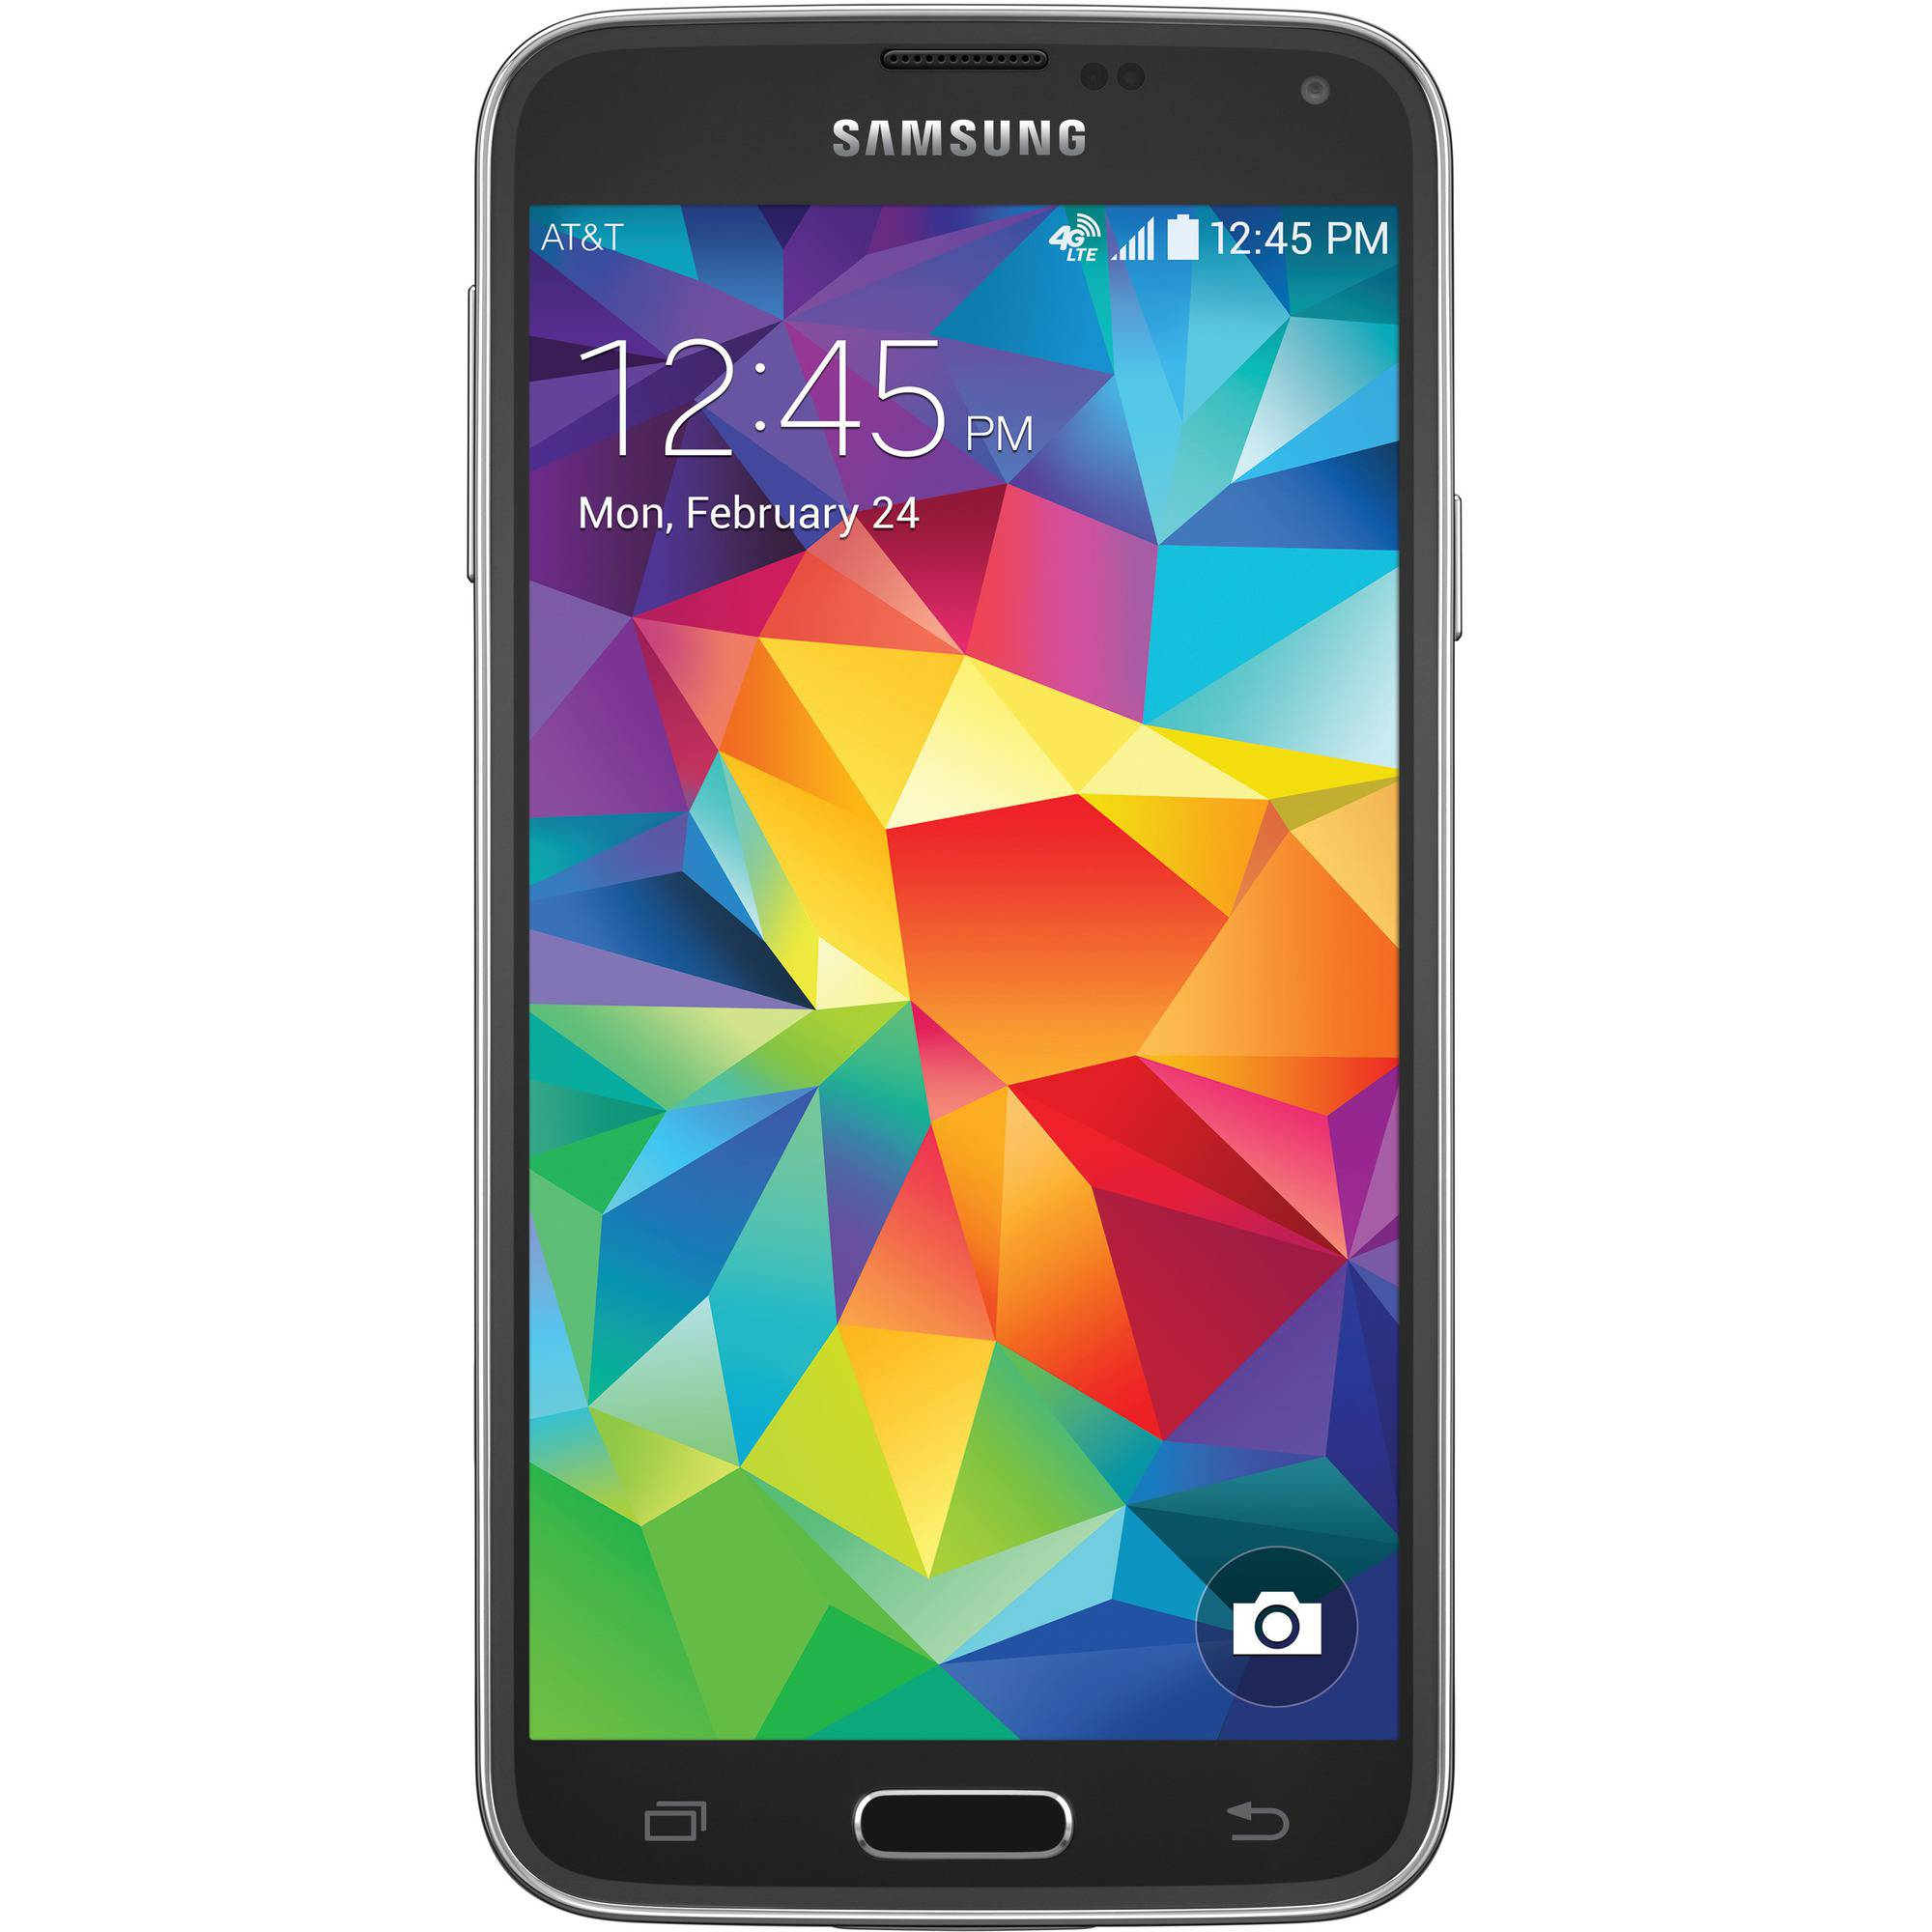 Samsung Galaxy S5 Certified Pre-Owned Smartphone, (Verizon)